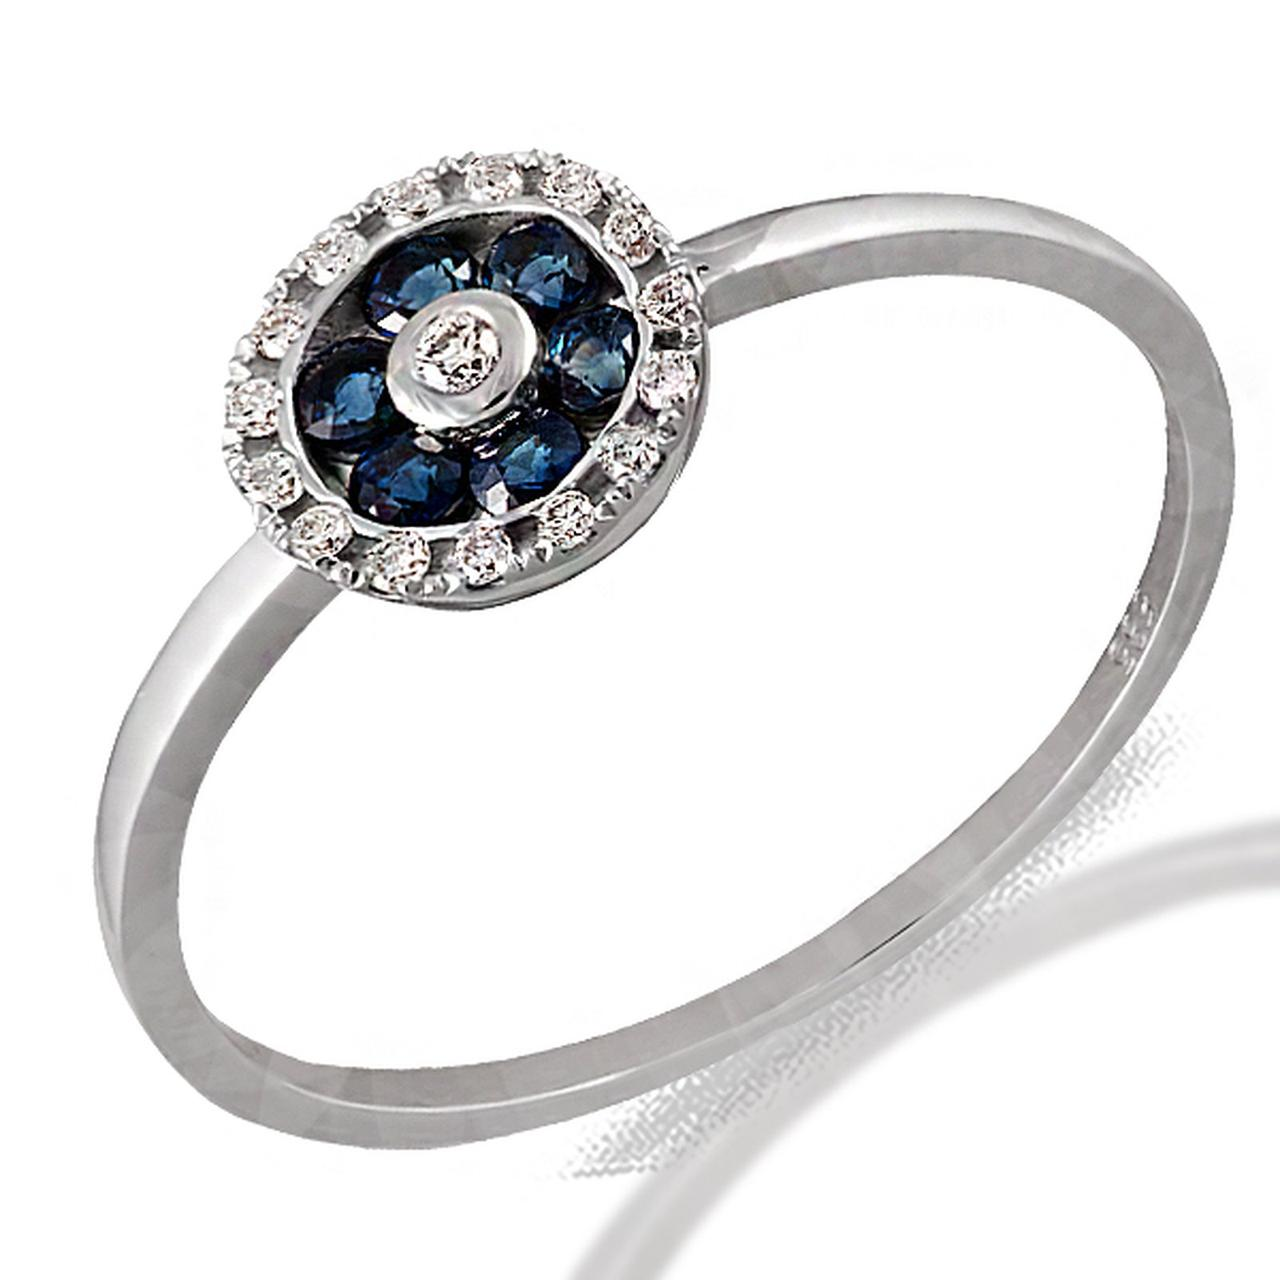 Золотое кольцо с бриллиантами и сапфирами, размер 16.5 (056628)